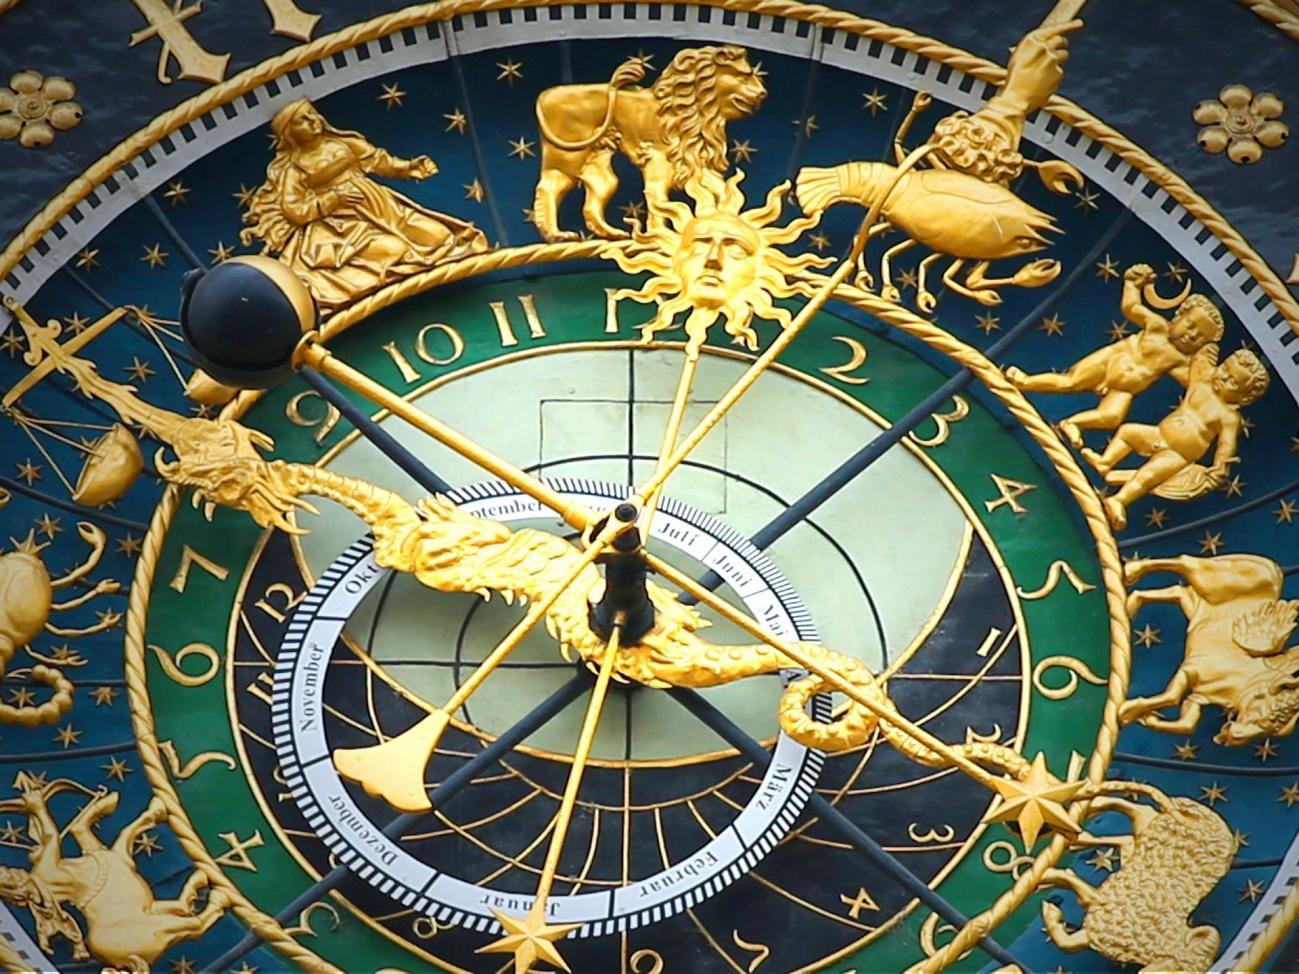 C:\Users\pc\Downloads\astronomical-clock-408306_1920.jpg